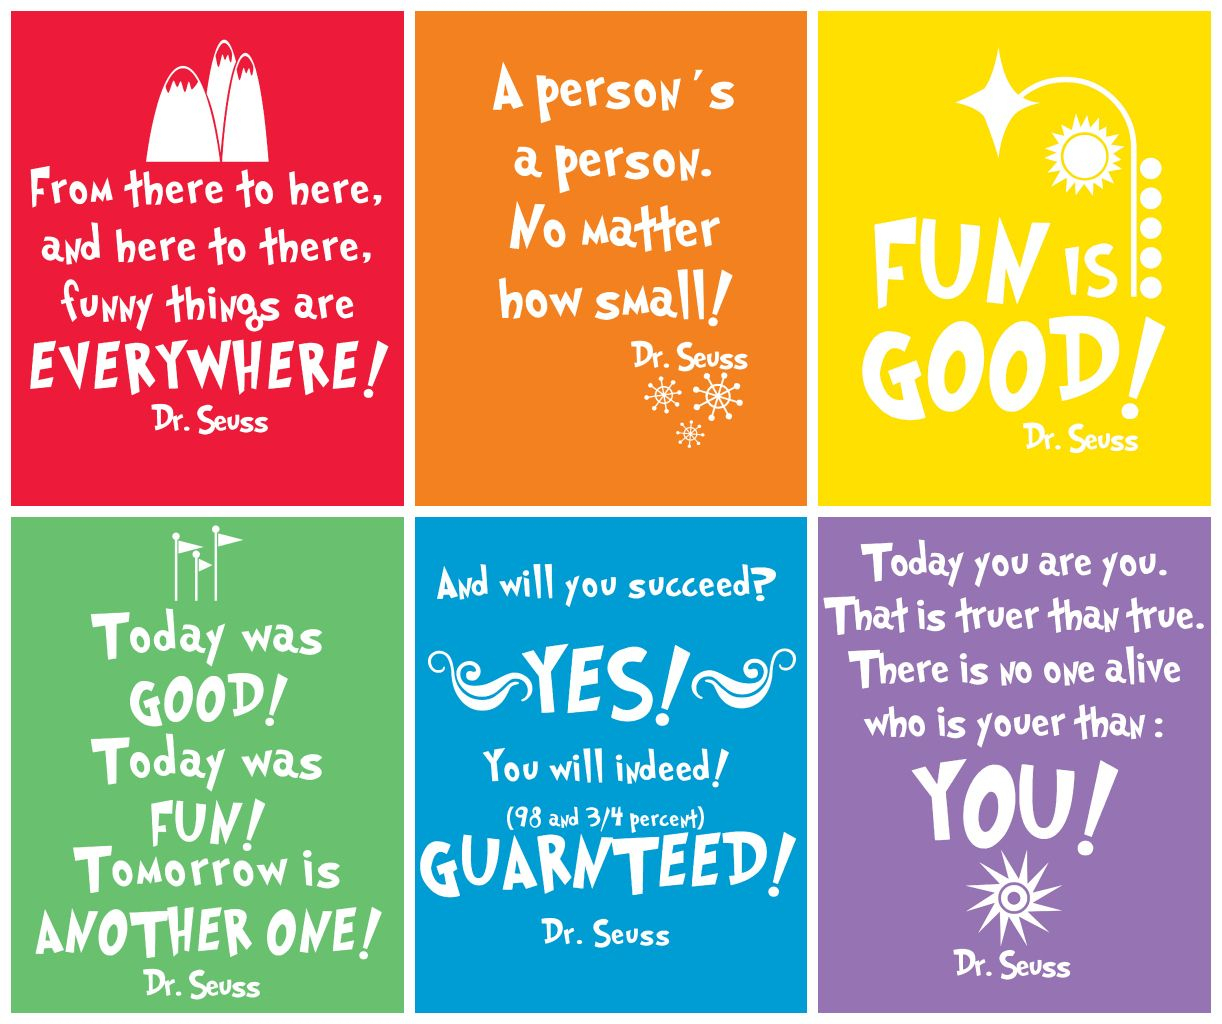 Free Prints} Dr Seuss   Dr. Seuss   Pinterest   Printables, Free - Free Printable Dr Seuss Quotes